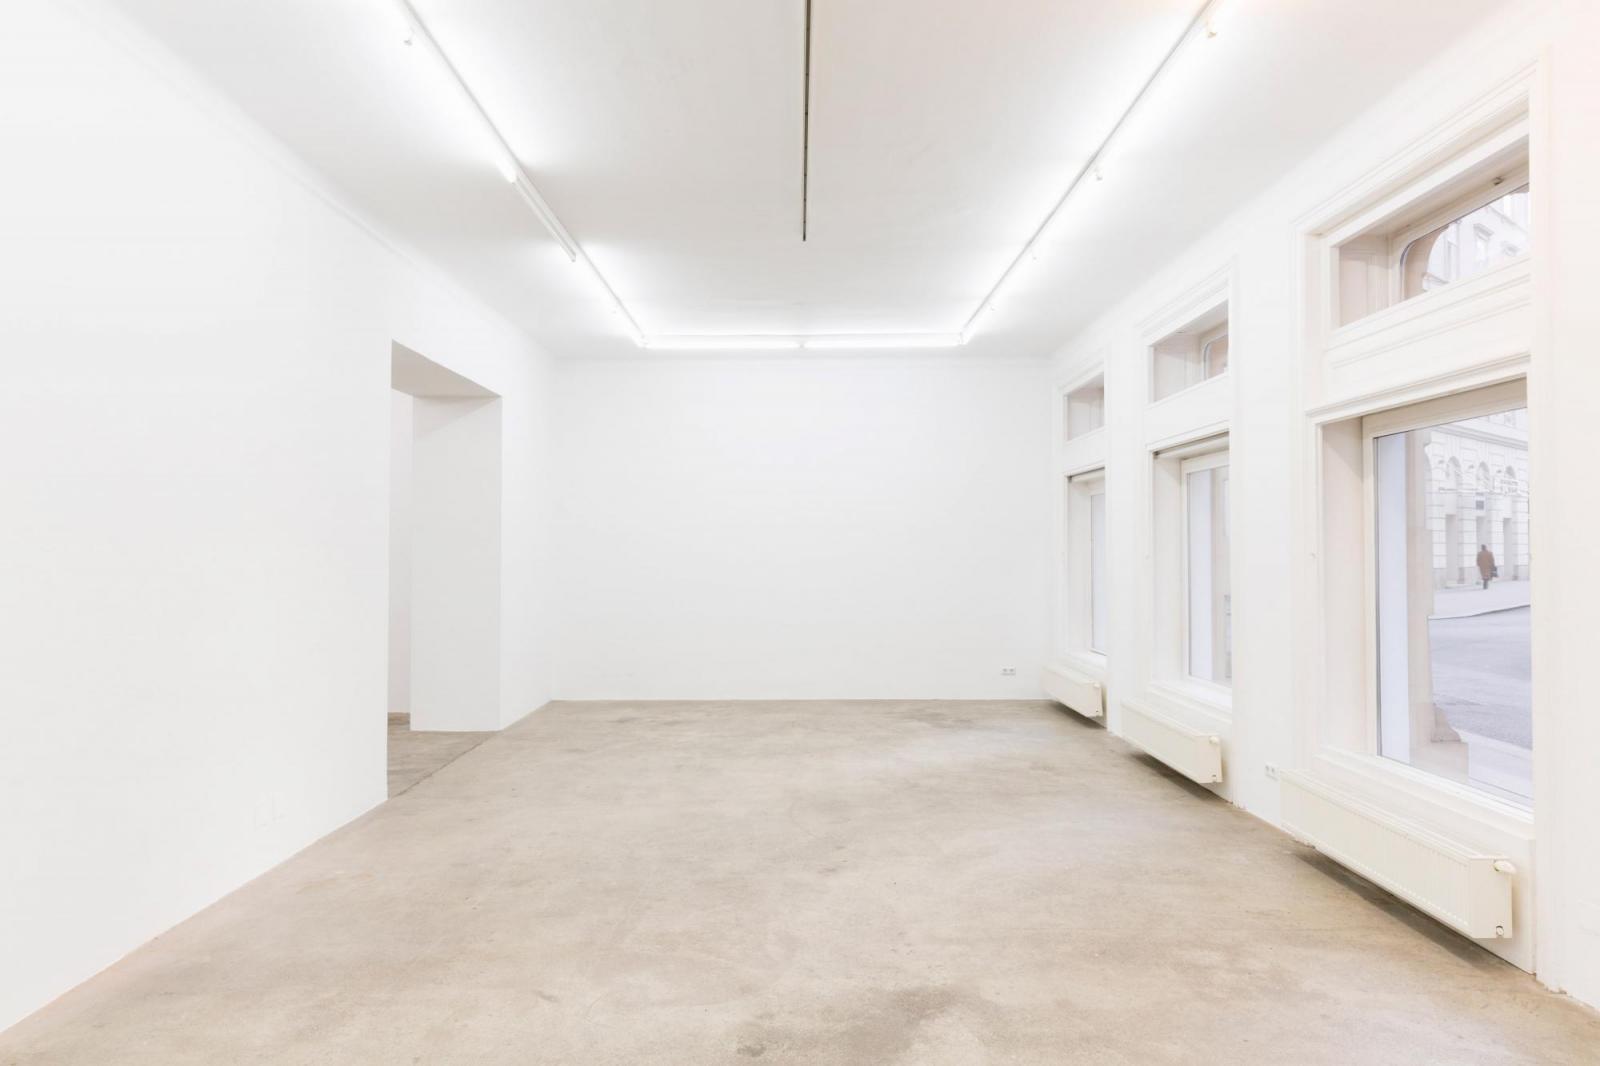 Galerie Sophie Tappeiner